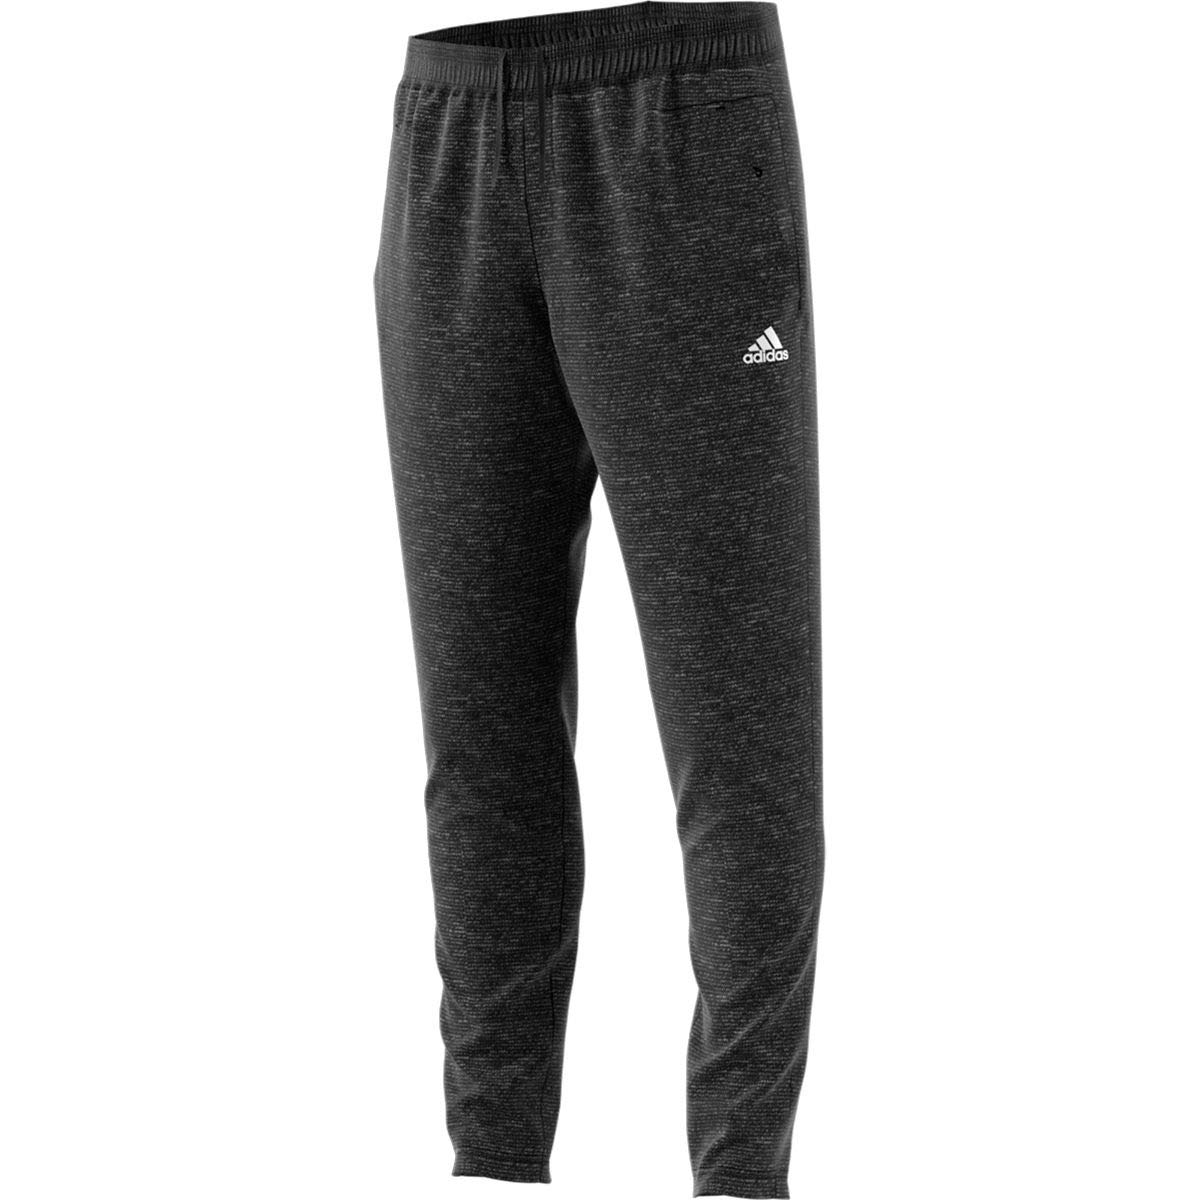 dd541b6fba adidas Men's Athletics ID Stadium Pants